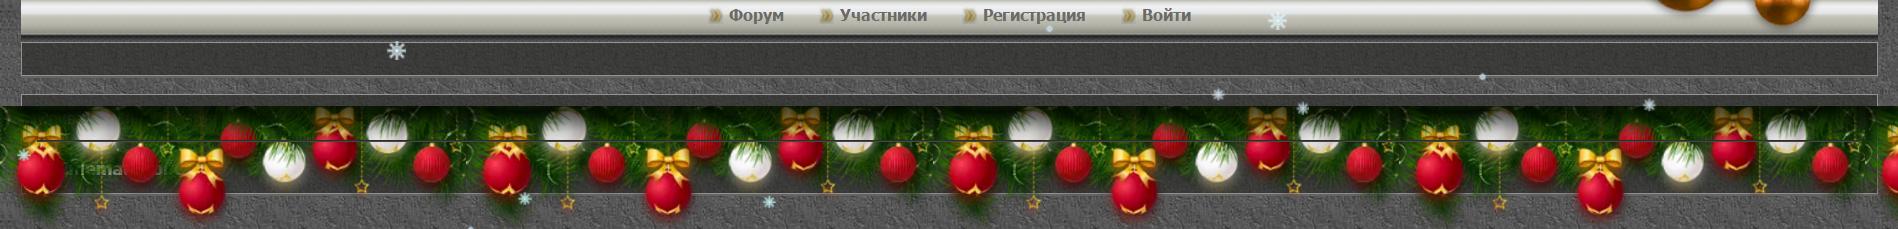 http://s0.uploads.ru/8xUC5.png